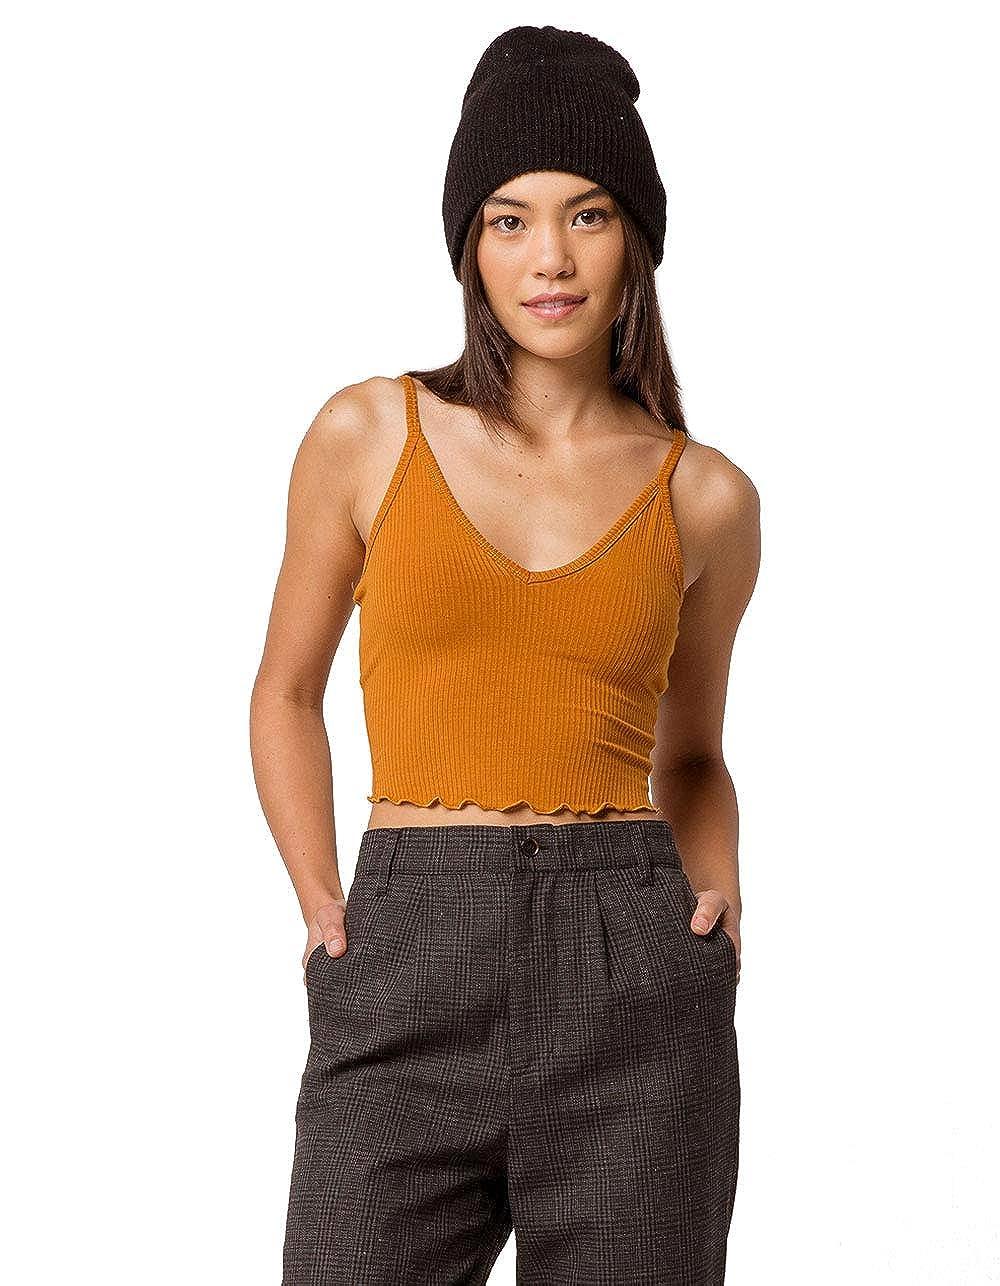 36b4e3ee28 Bozzolo V-Neck Lettuce Edge White Crop Tank Top at Amazon Women s Clothing  store